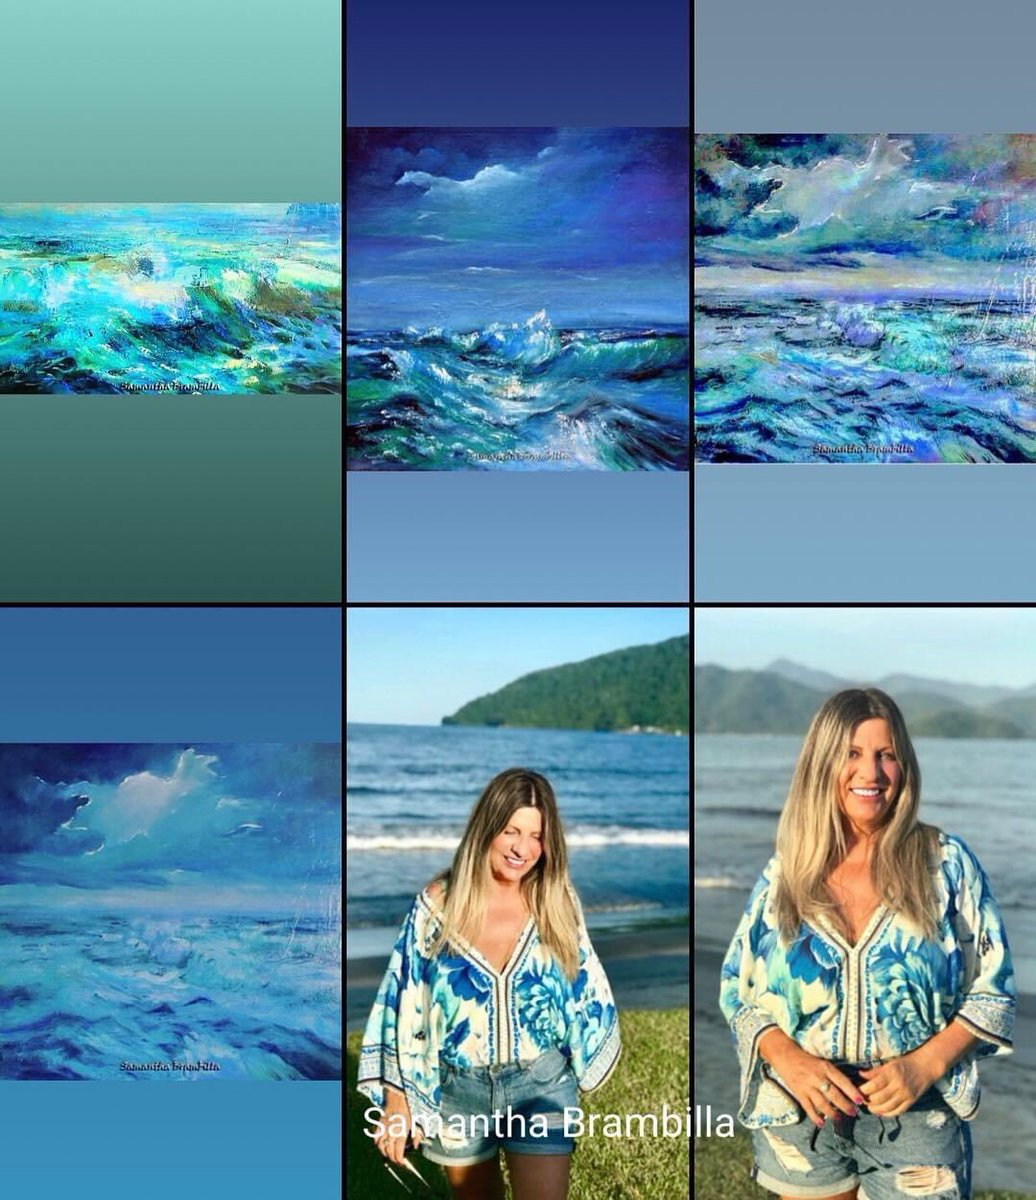 Artista Samantha Brambilla retrata na Pintura. Momentos nos mares#samanthabrambilla #mers  #landschaftsfotografie  #oilpaintingpic.twitter.com/cdRGmkubVV